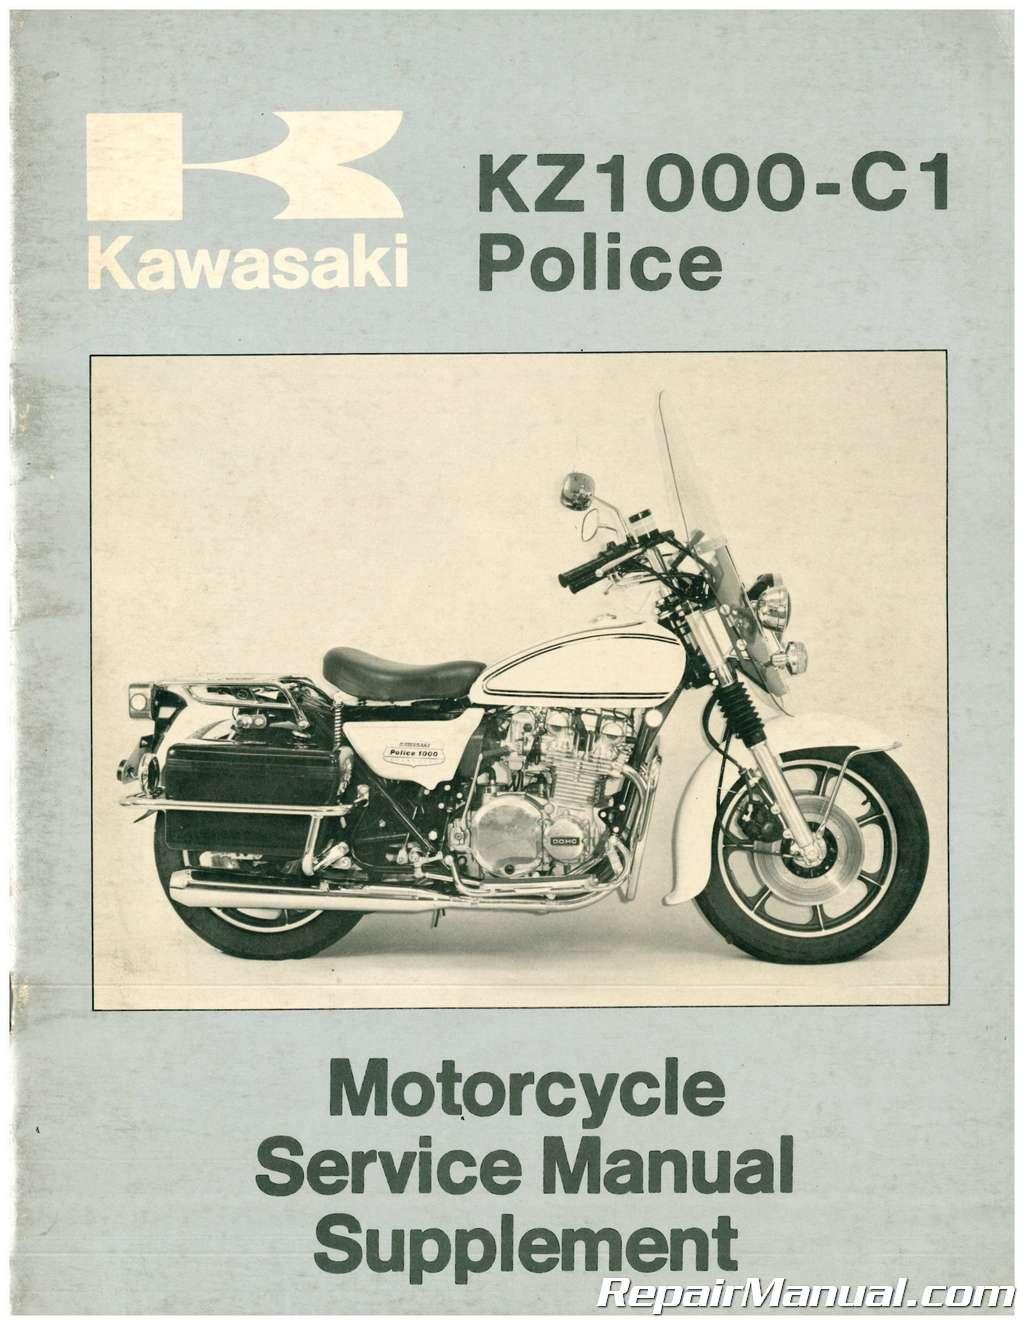 Used 1977 Kawasaki Kz1000 C1 Police Motorcycle Service Manual Supplement Ebay